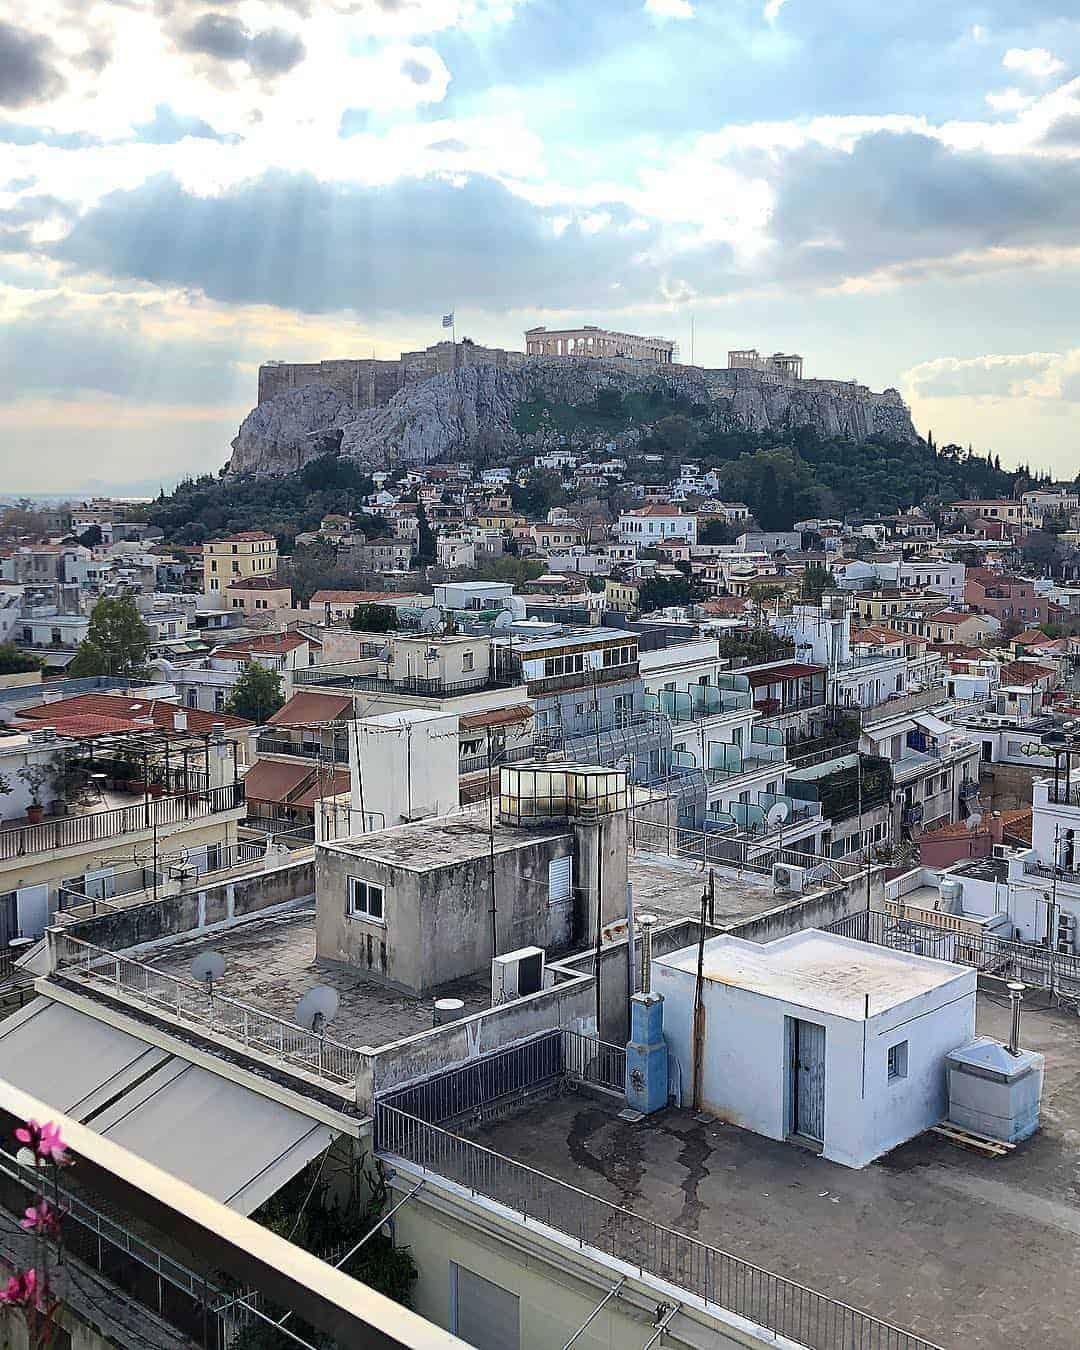 Electra Roof Garden, Central Athens